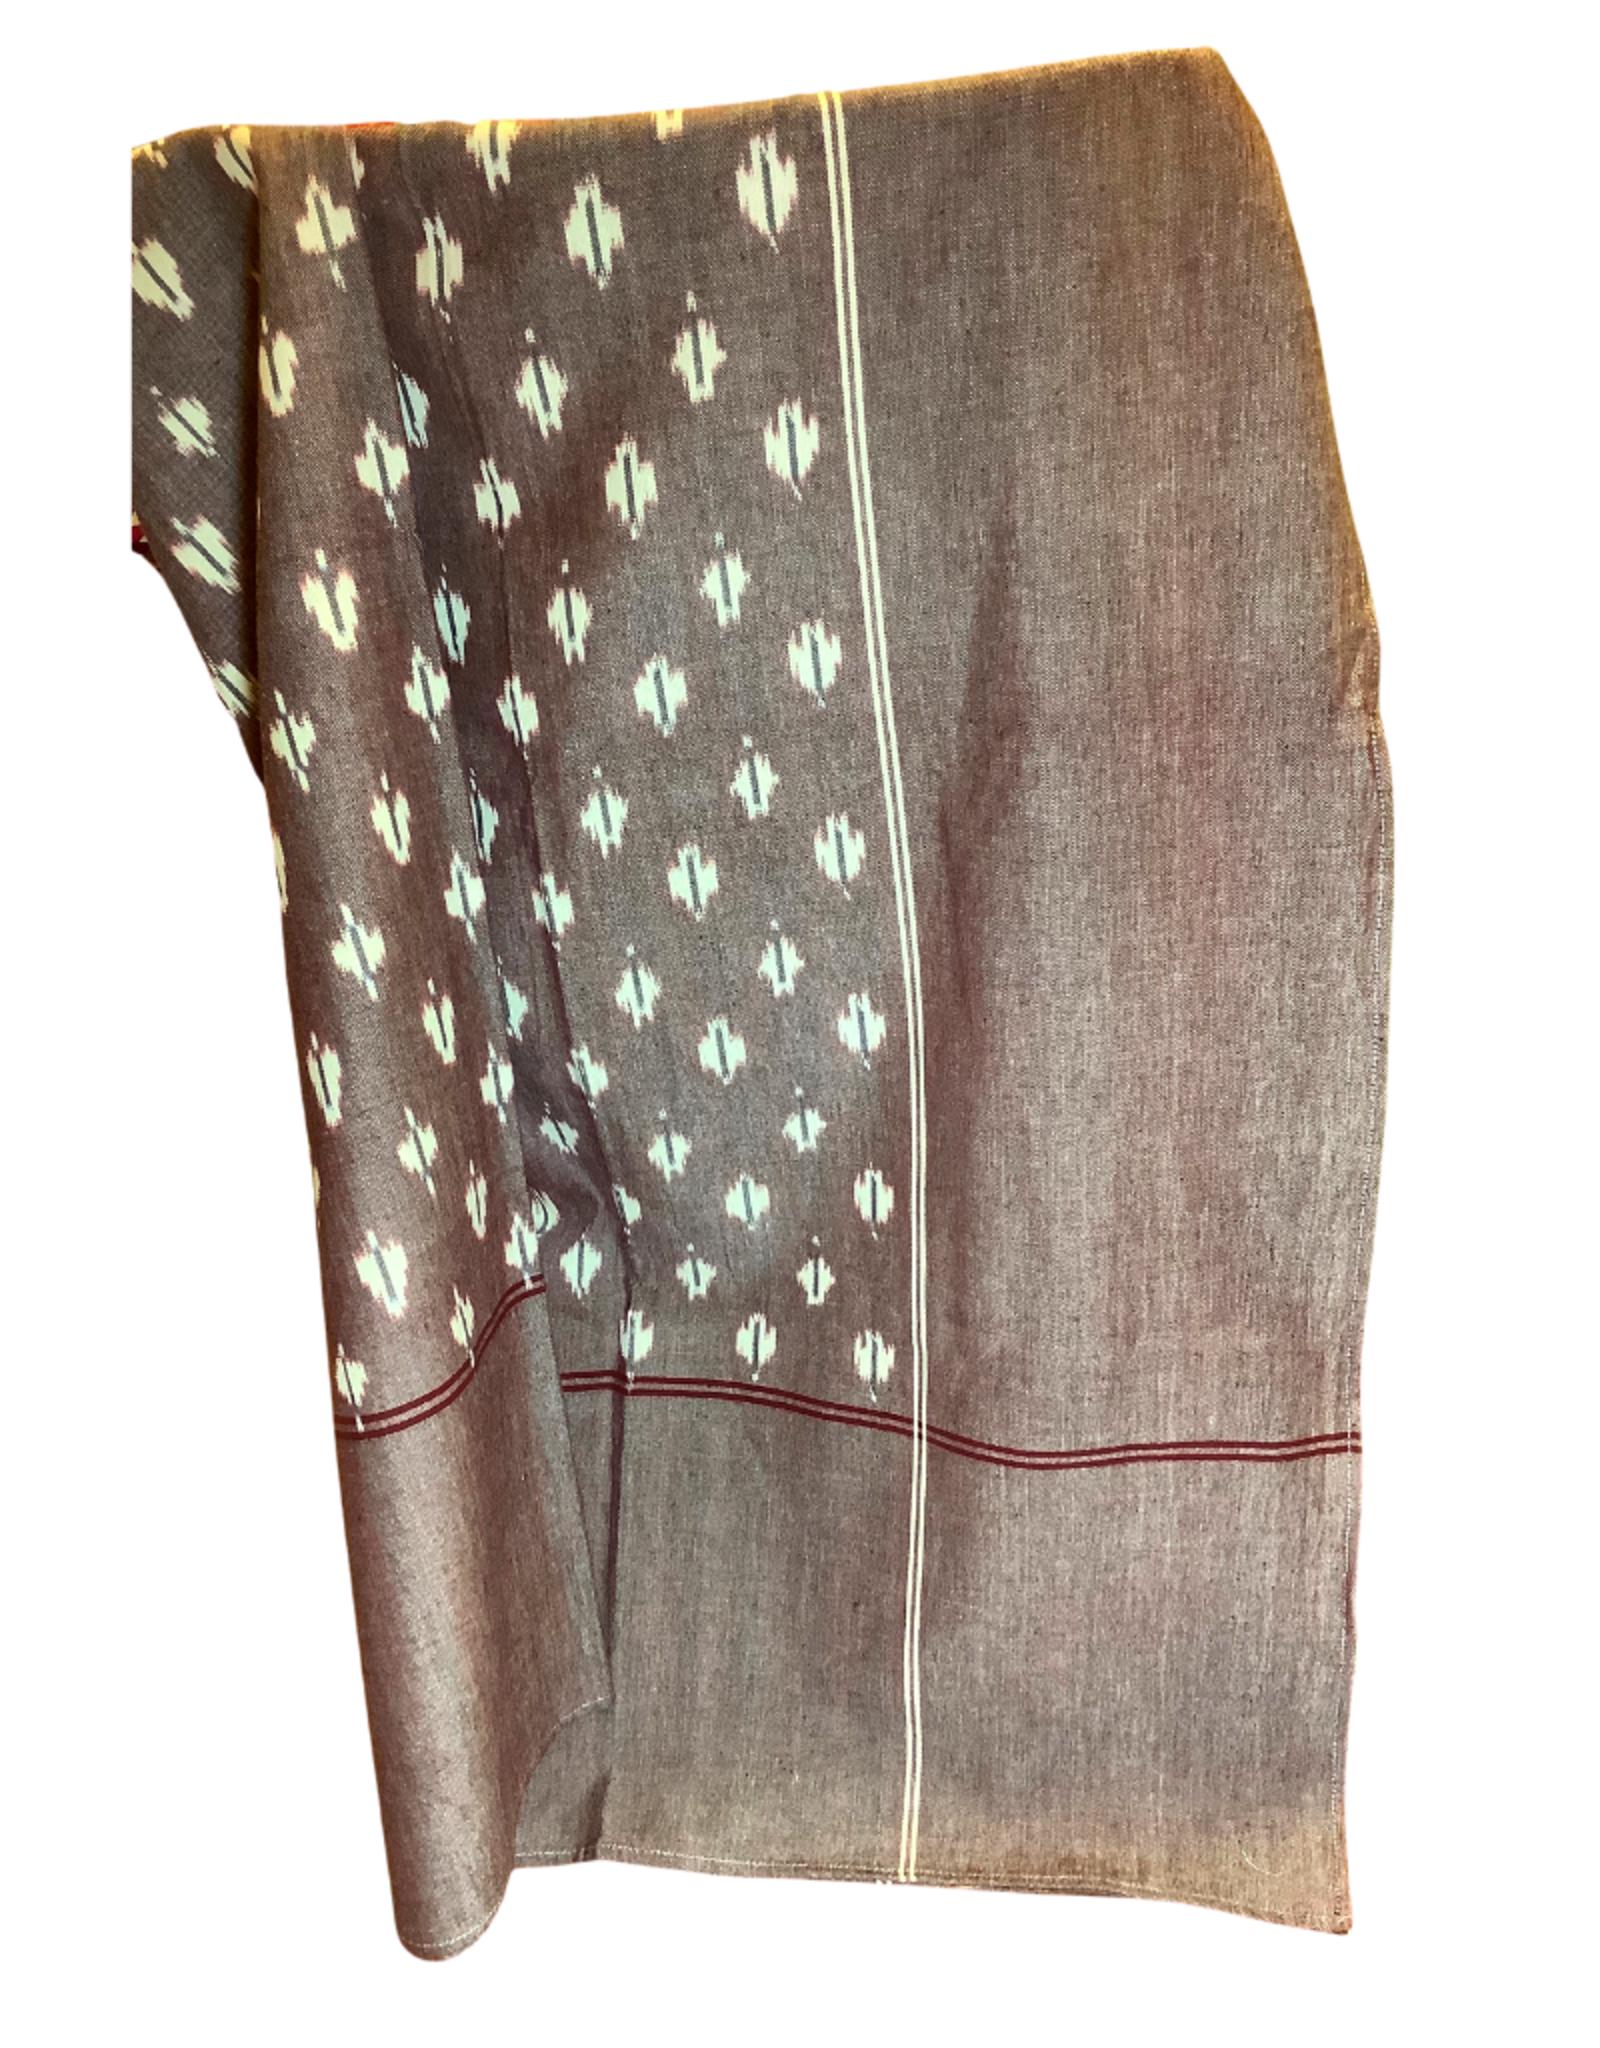 "Tablecloth, Cranberry Ikat, 152cm x 228cm / 60"" x 90"""